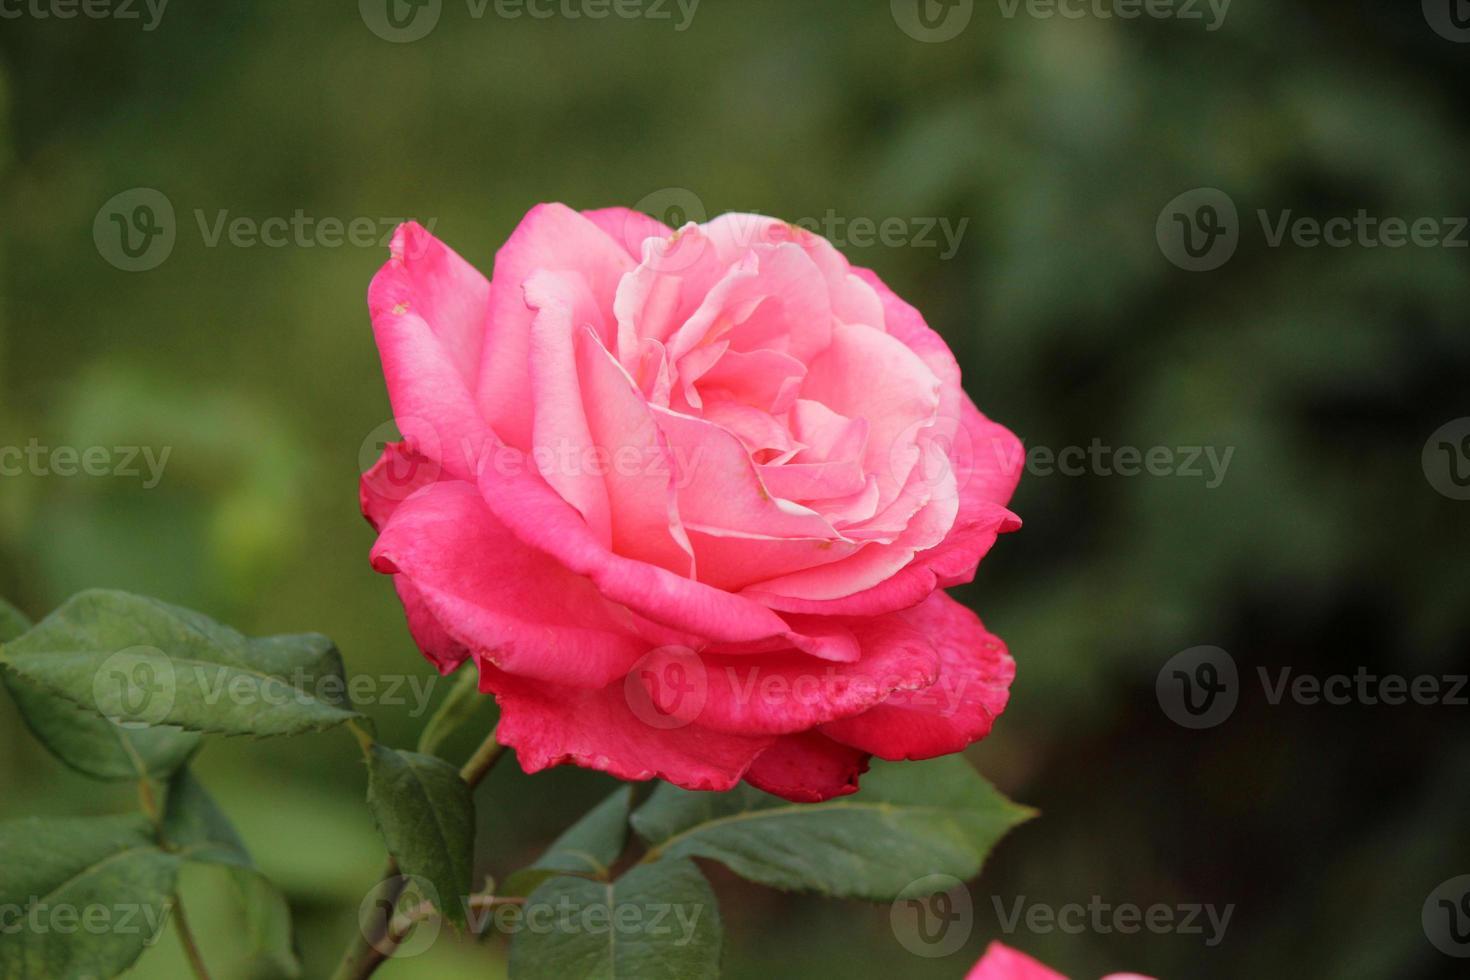 rosa earth light - rose photo